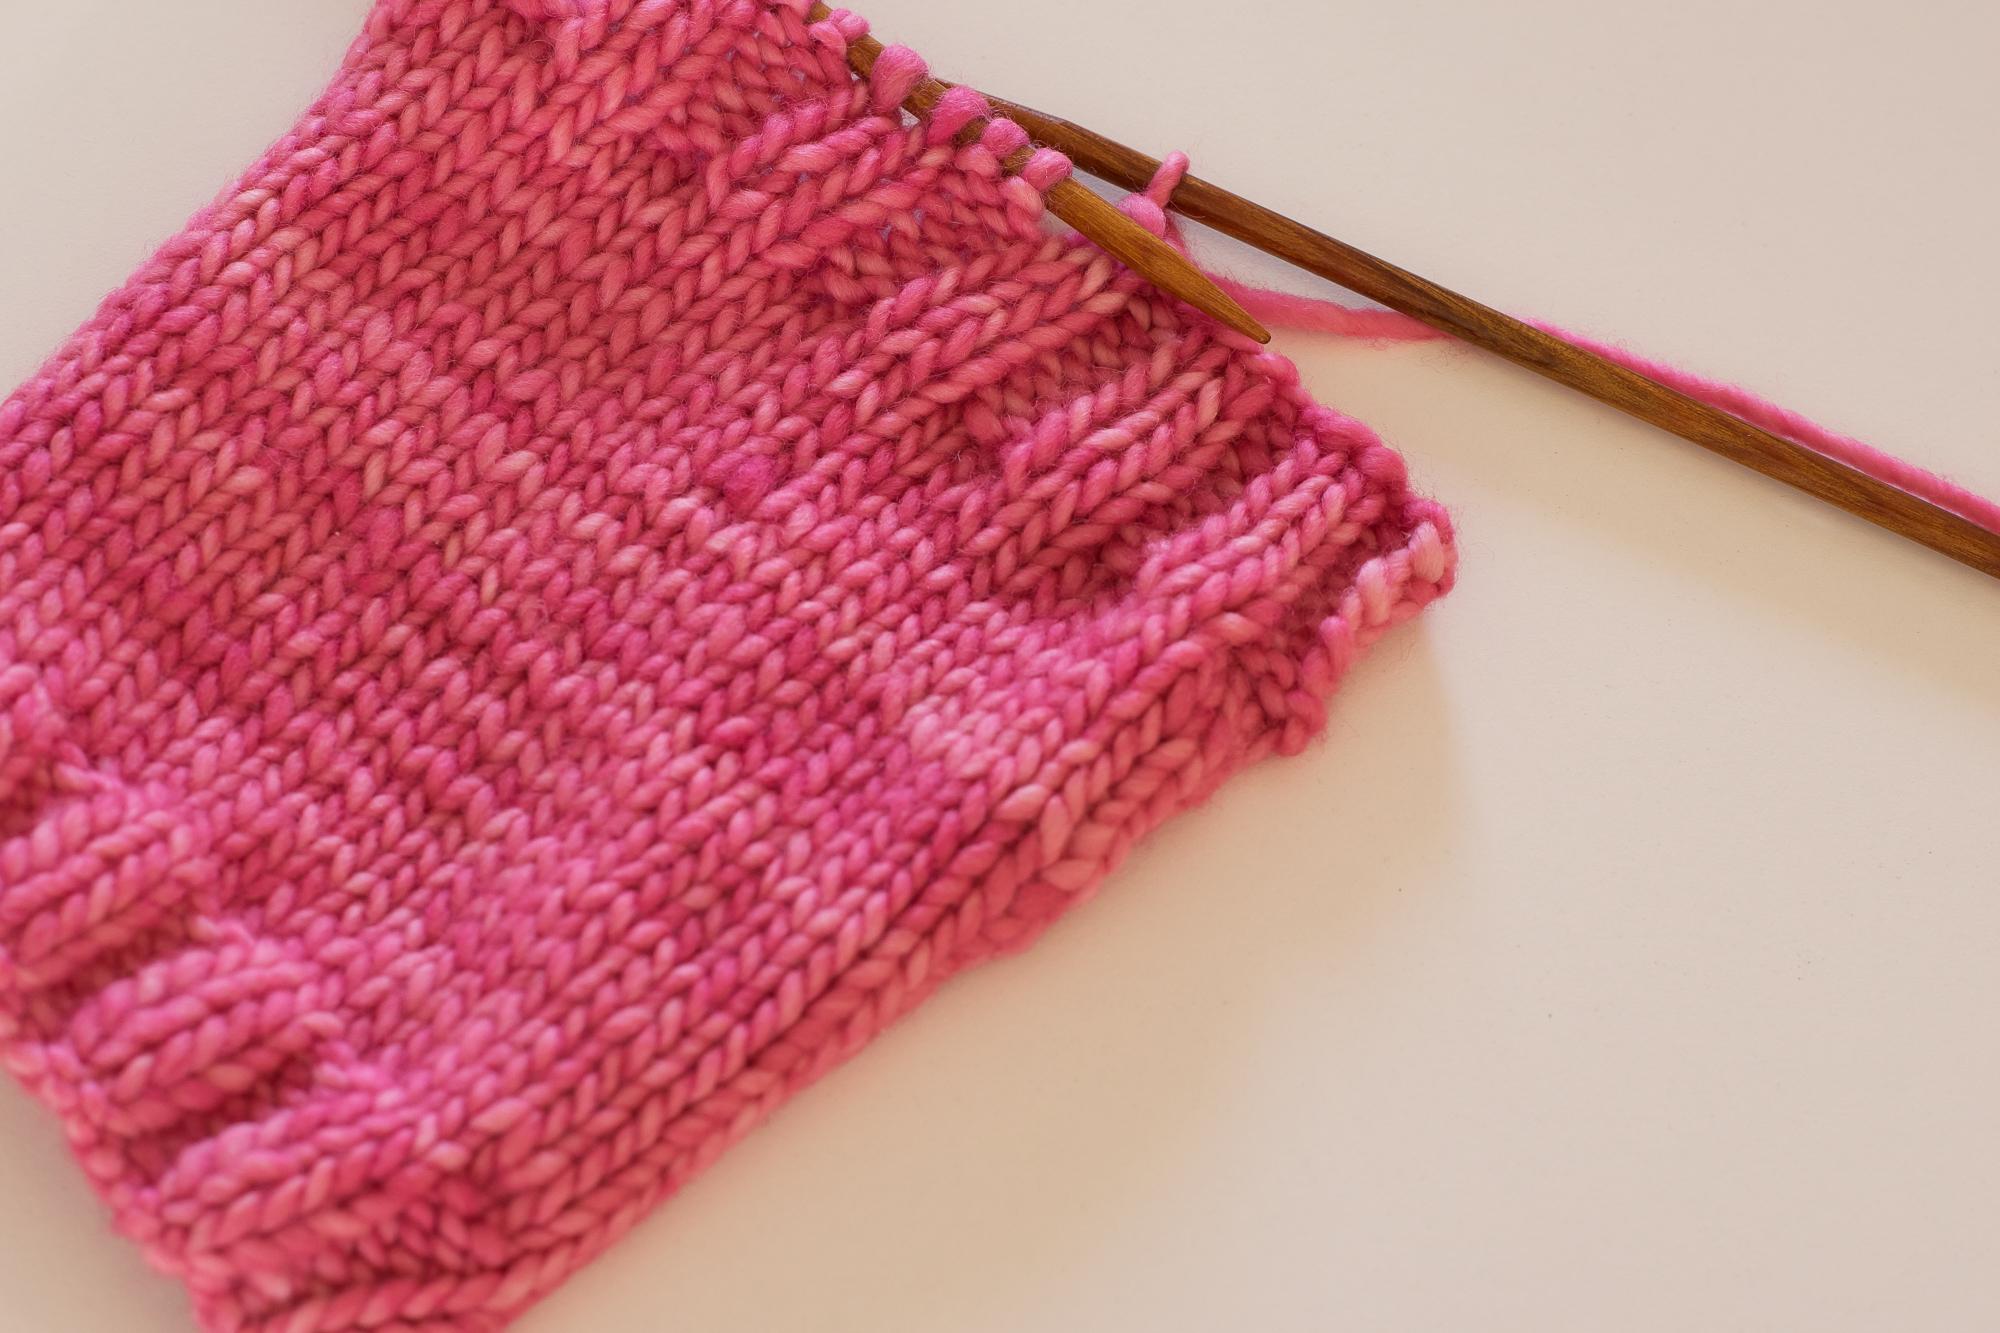 Binding off in pattern